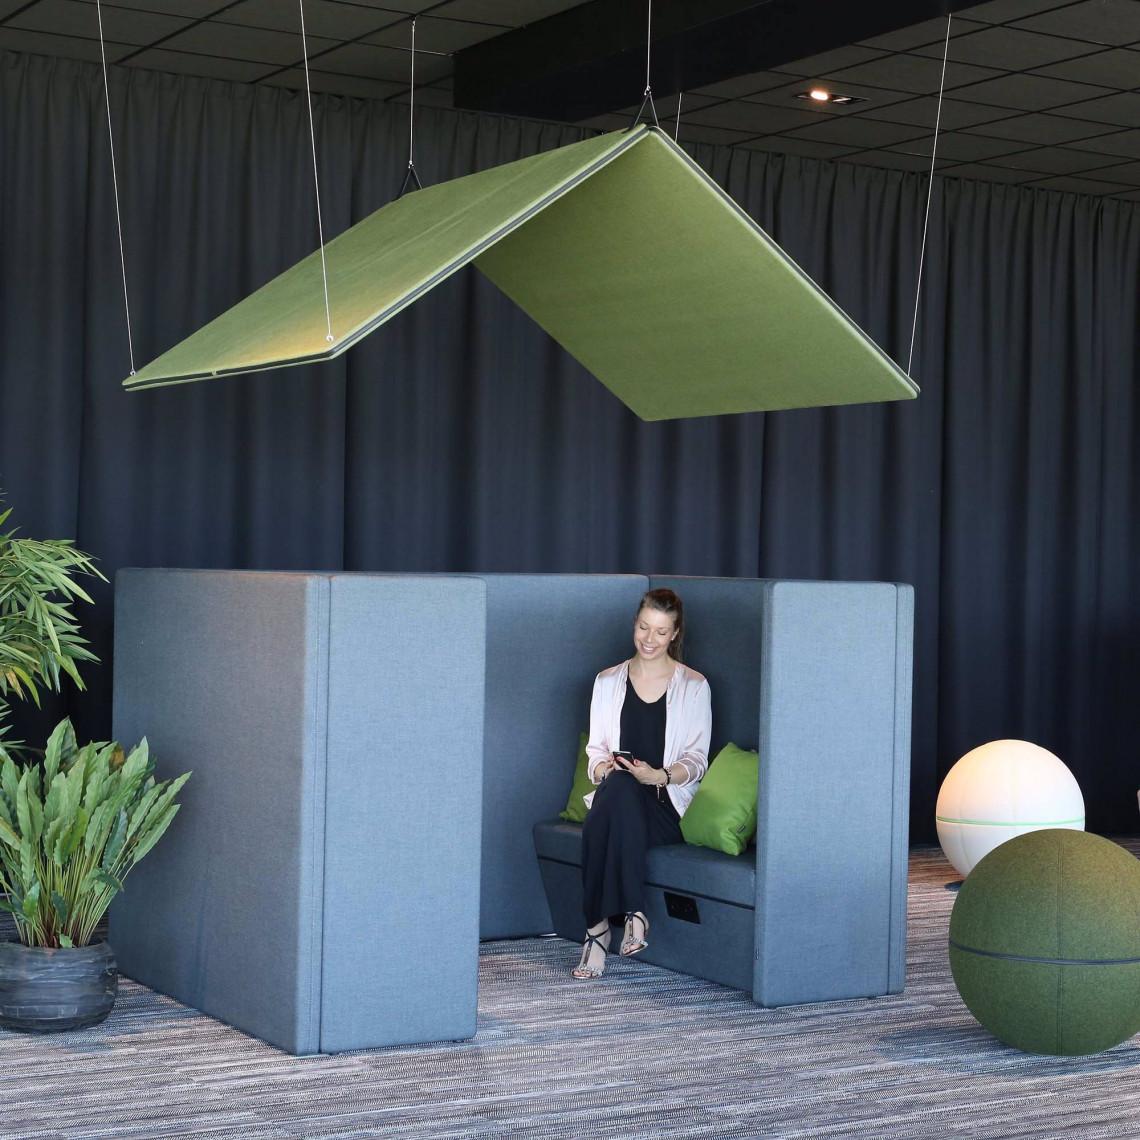 Sofa Silent Group, Ljudabsorberande möbel